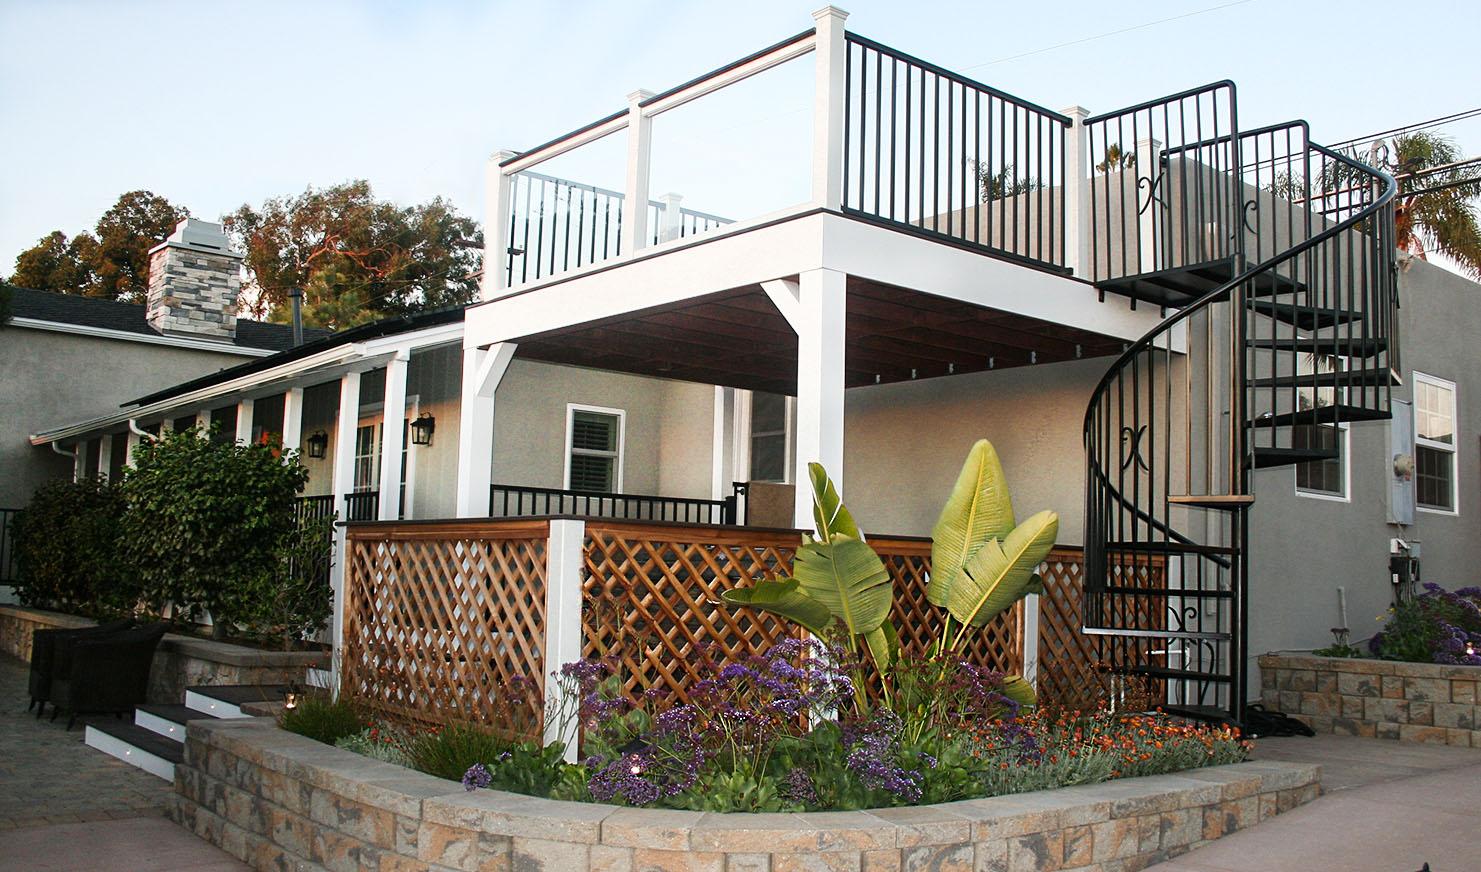 Cross Construction Backyard House, Flower Bed